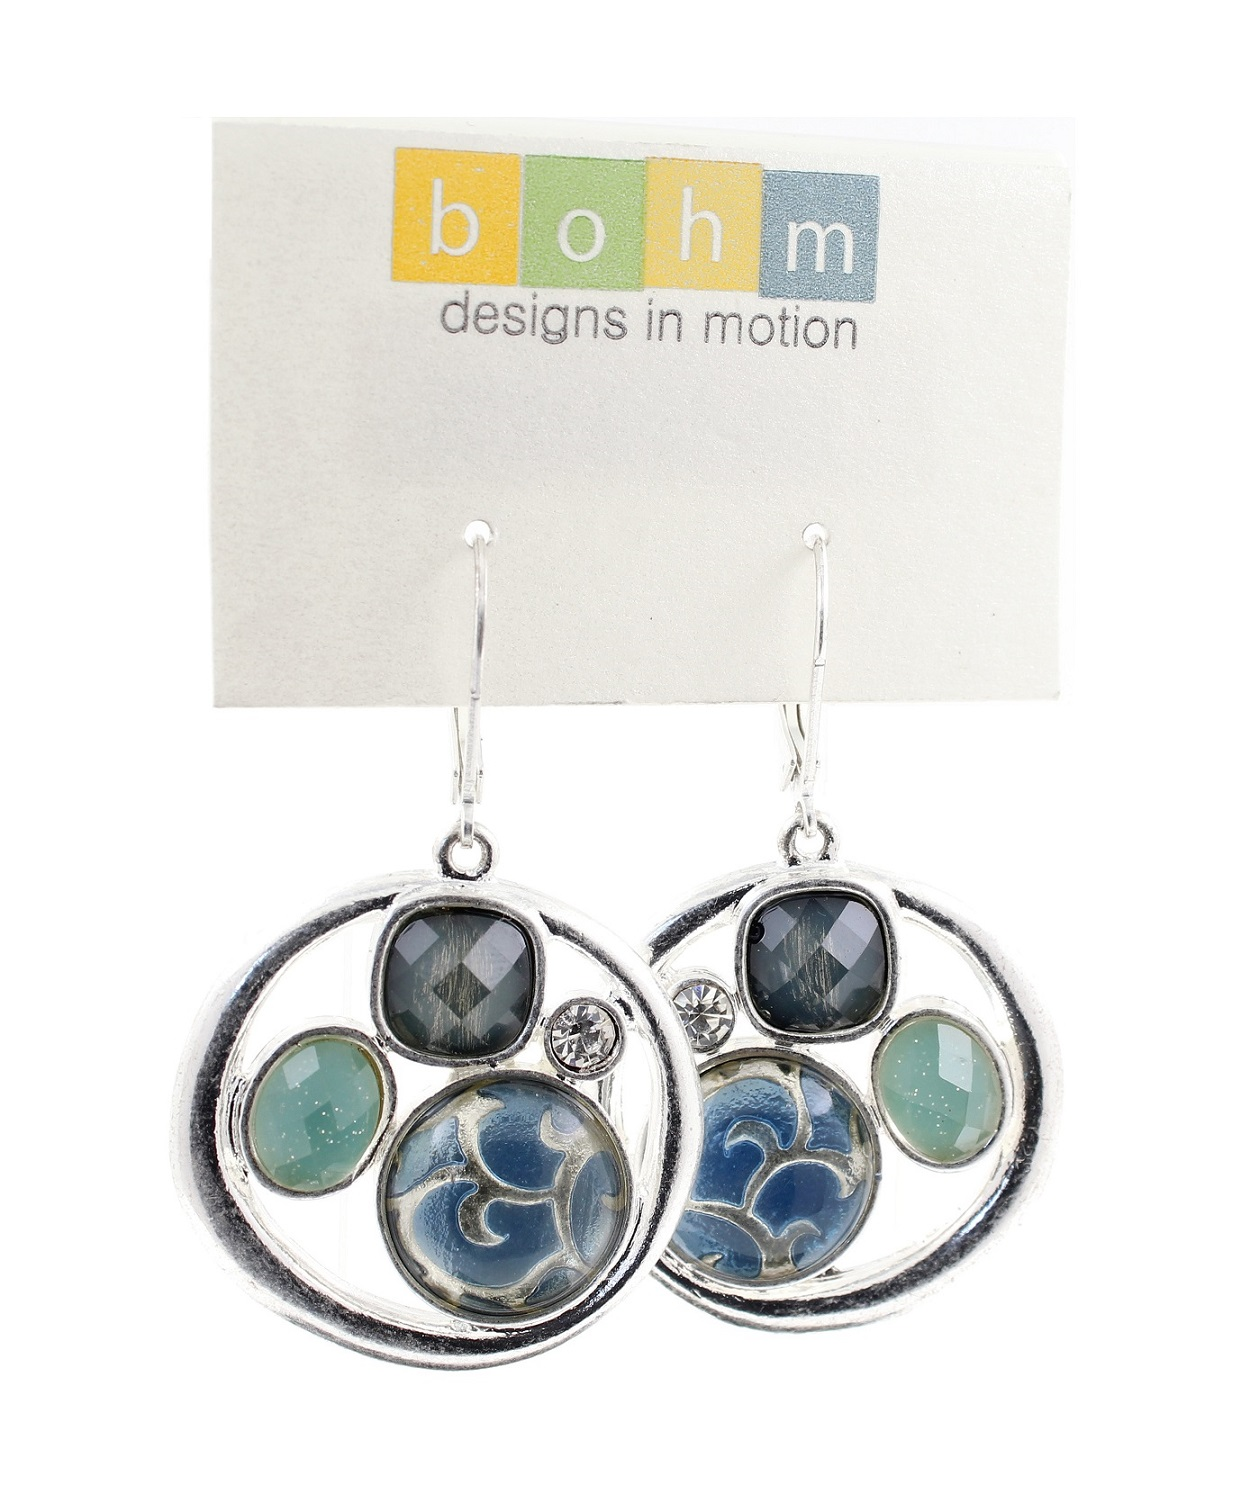 Bohm - City Chic - Disc Panel Earrings - Silver/Blue